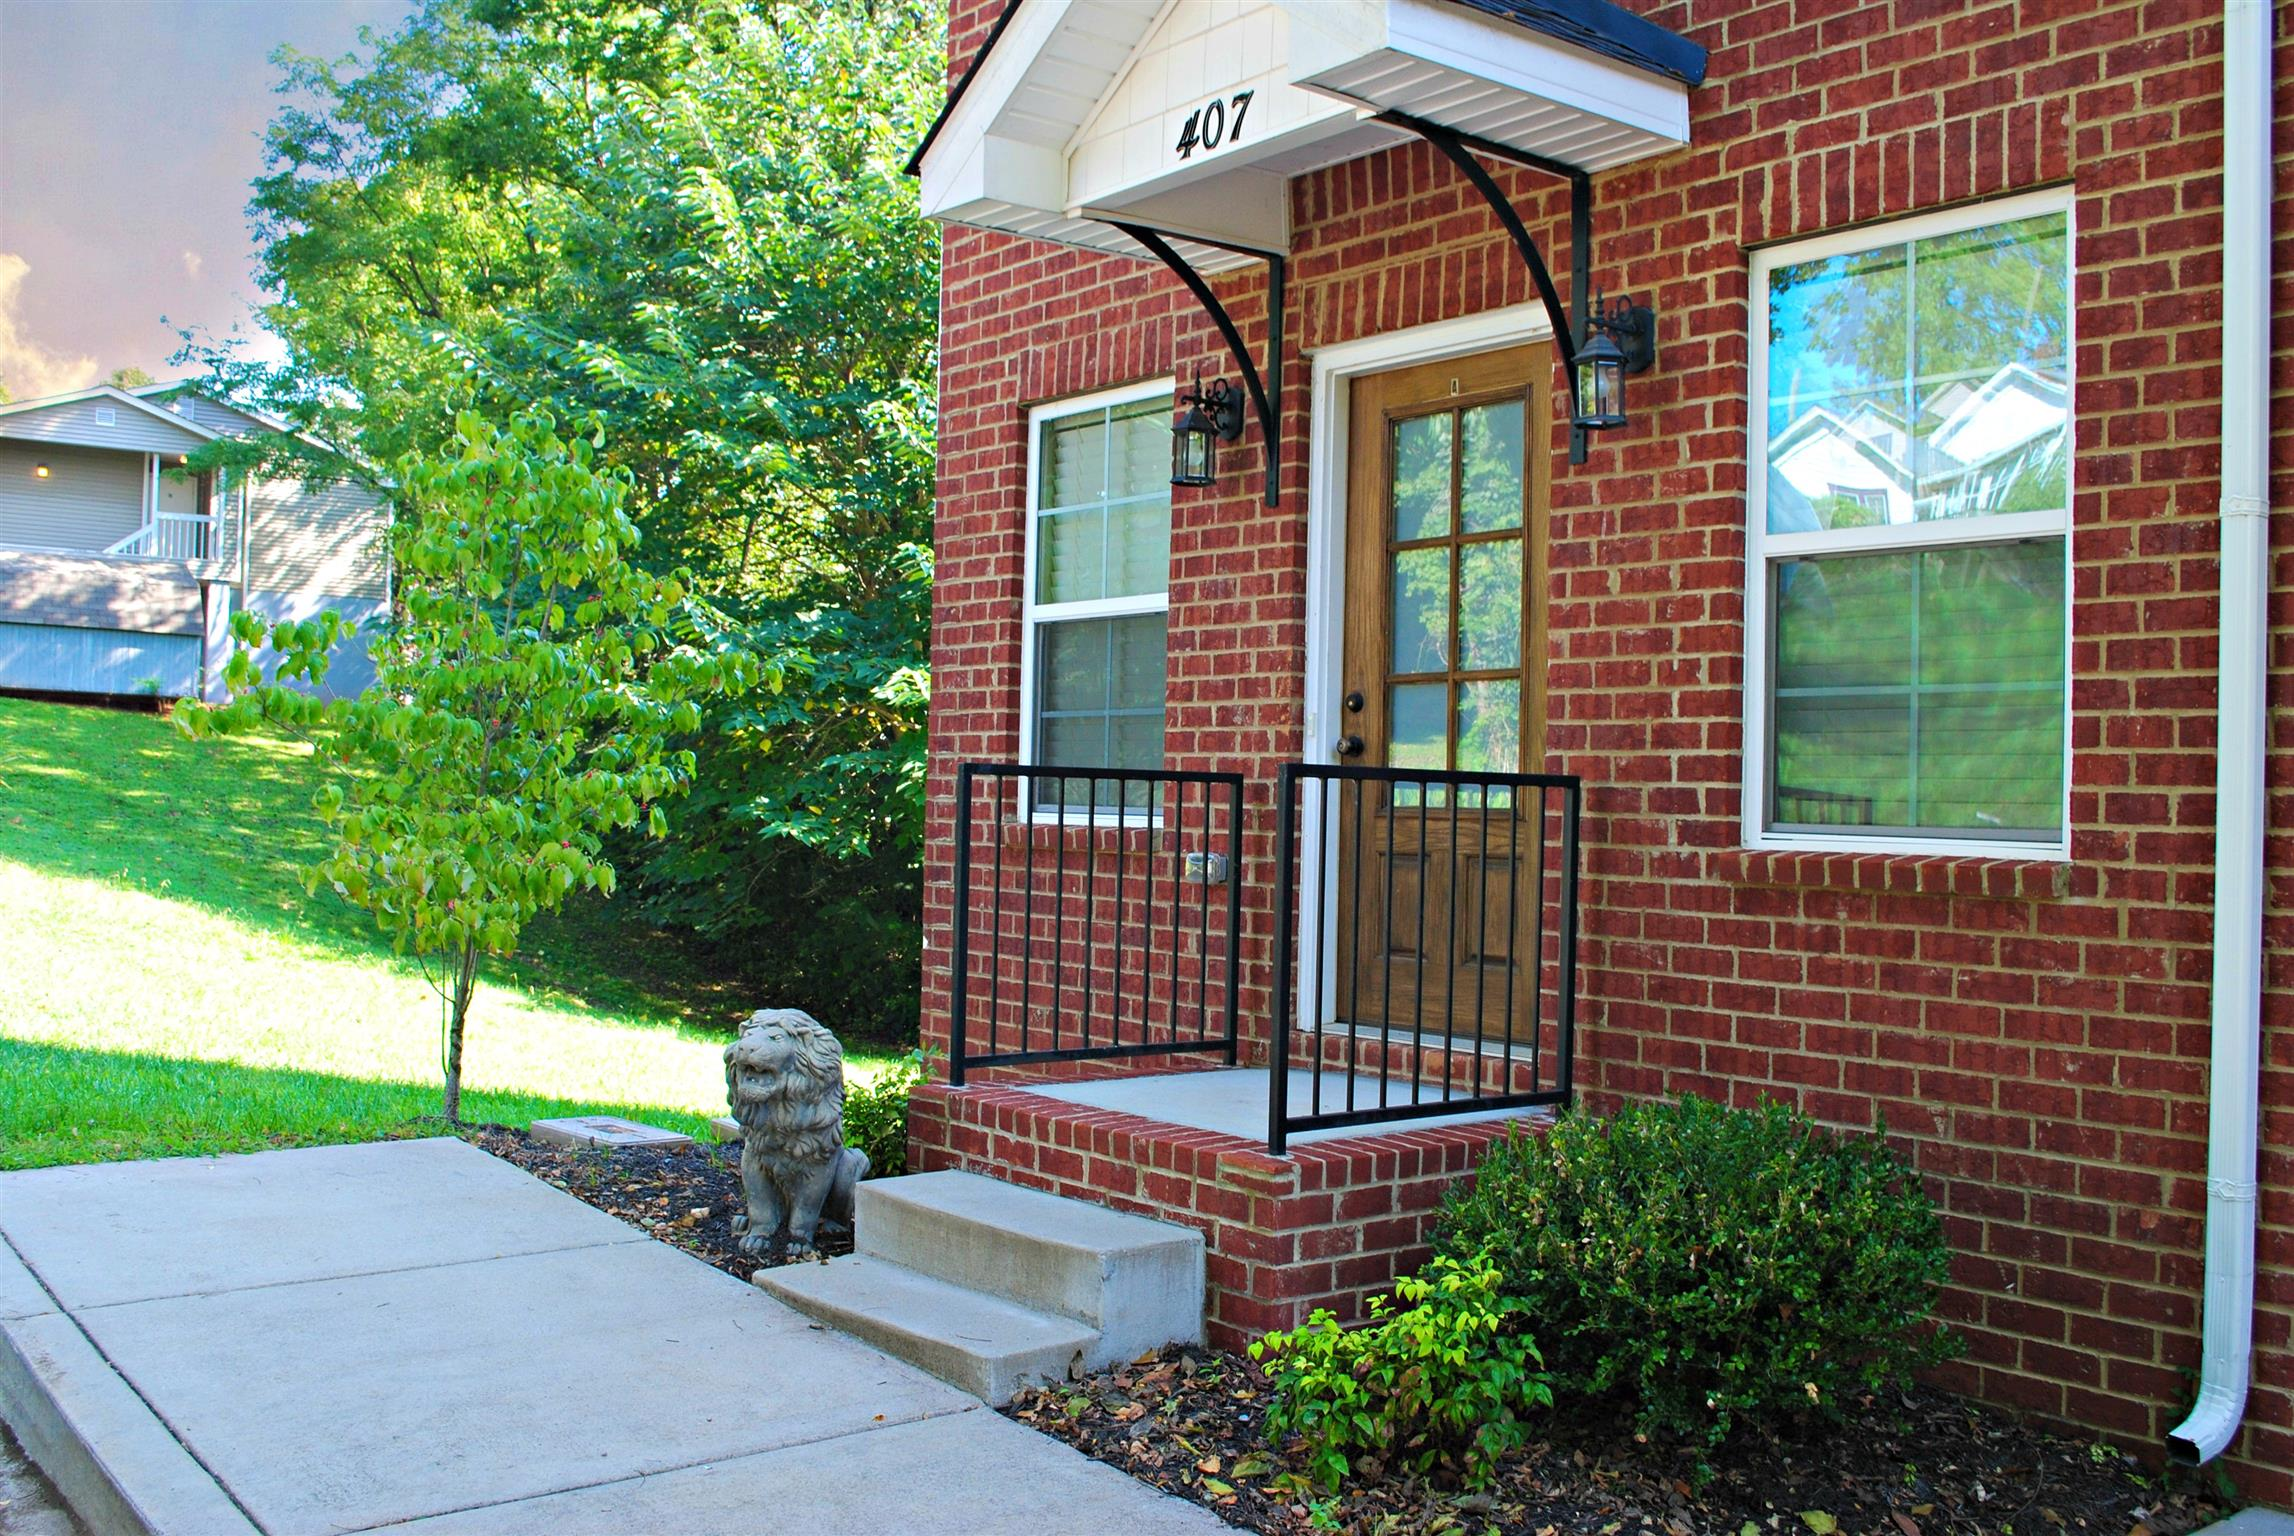 Homes for Sale in Kline Alley Estates Subdivision Clarksville TN 37040